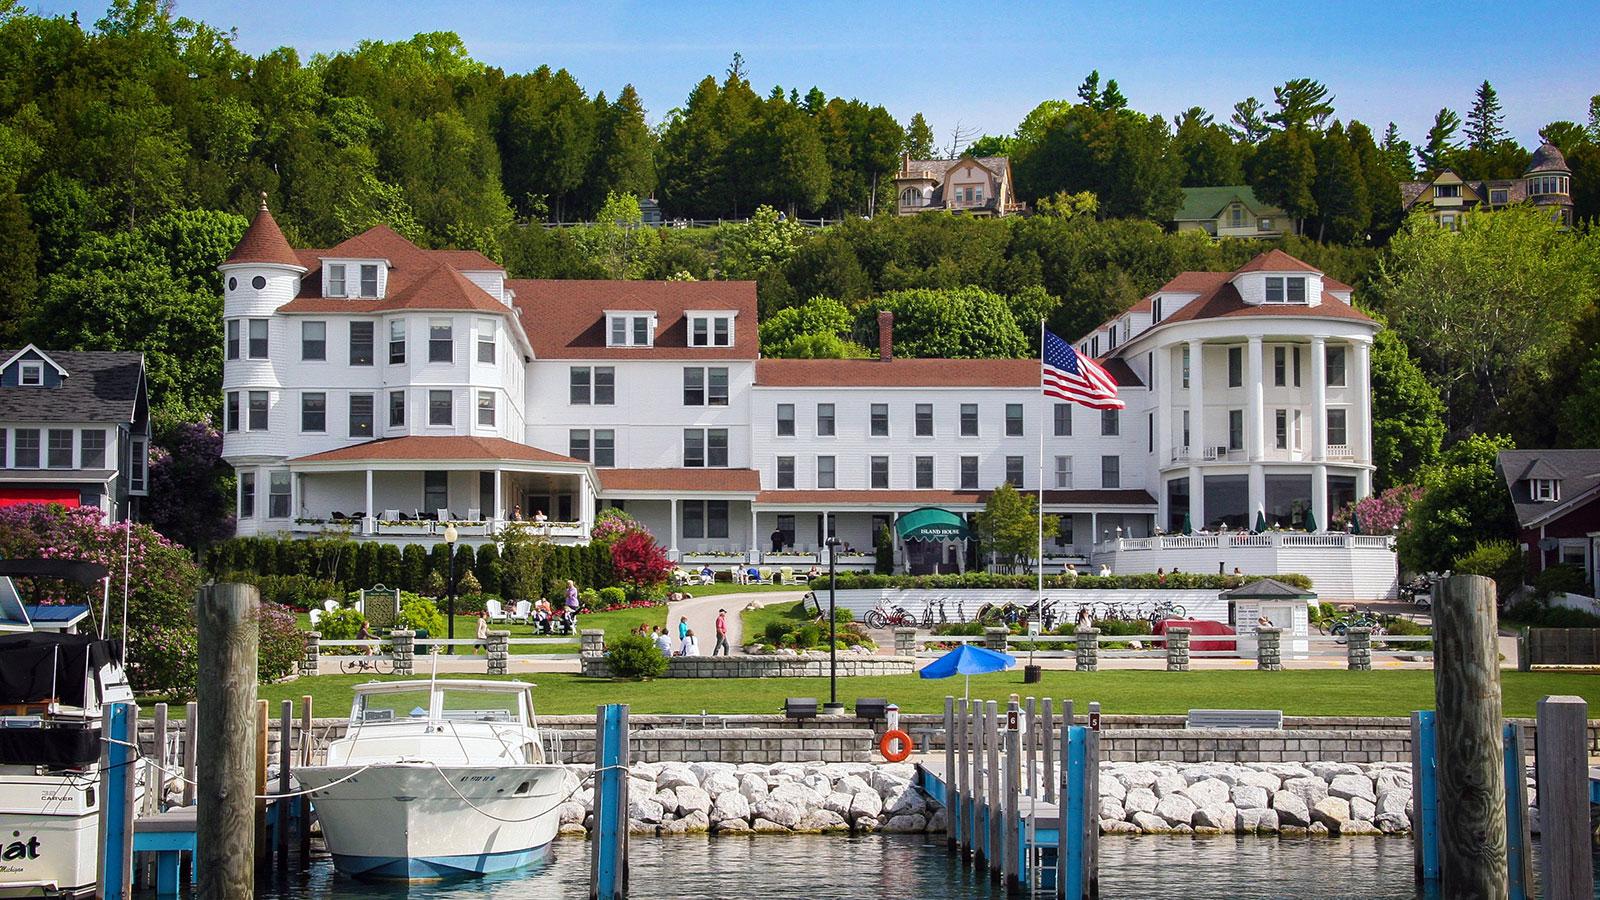 Island House Hotel